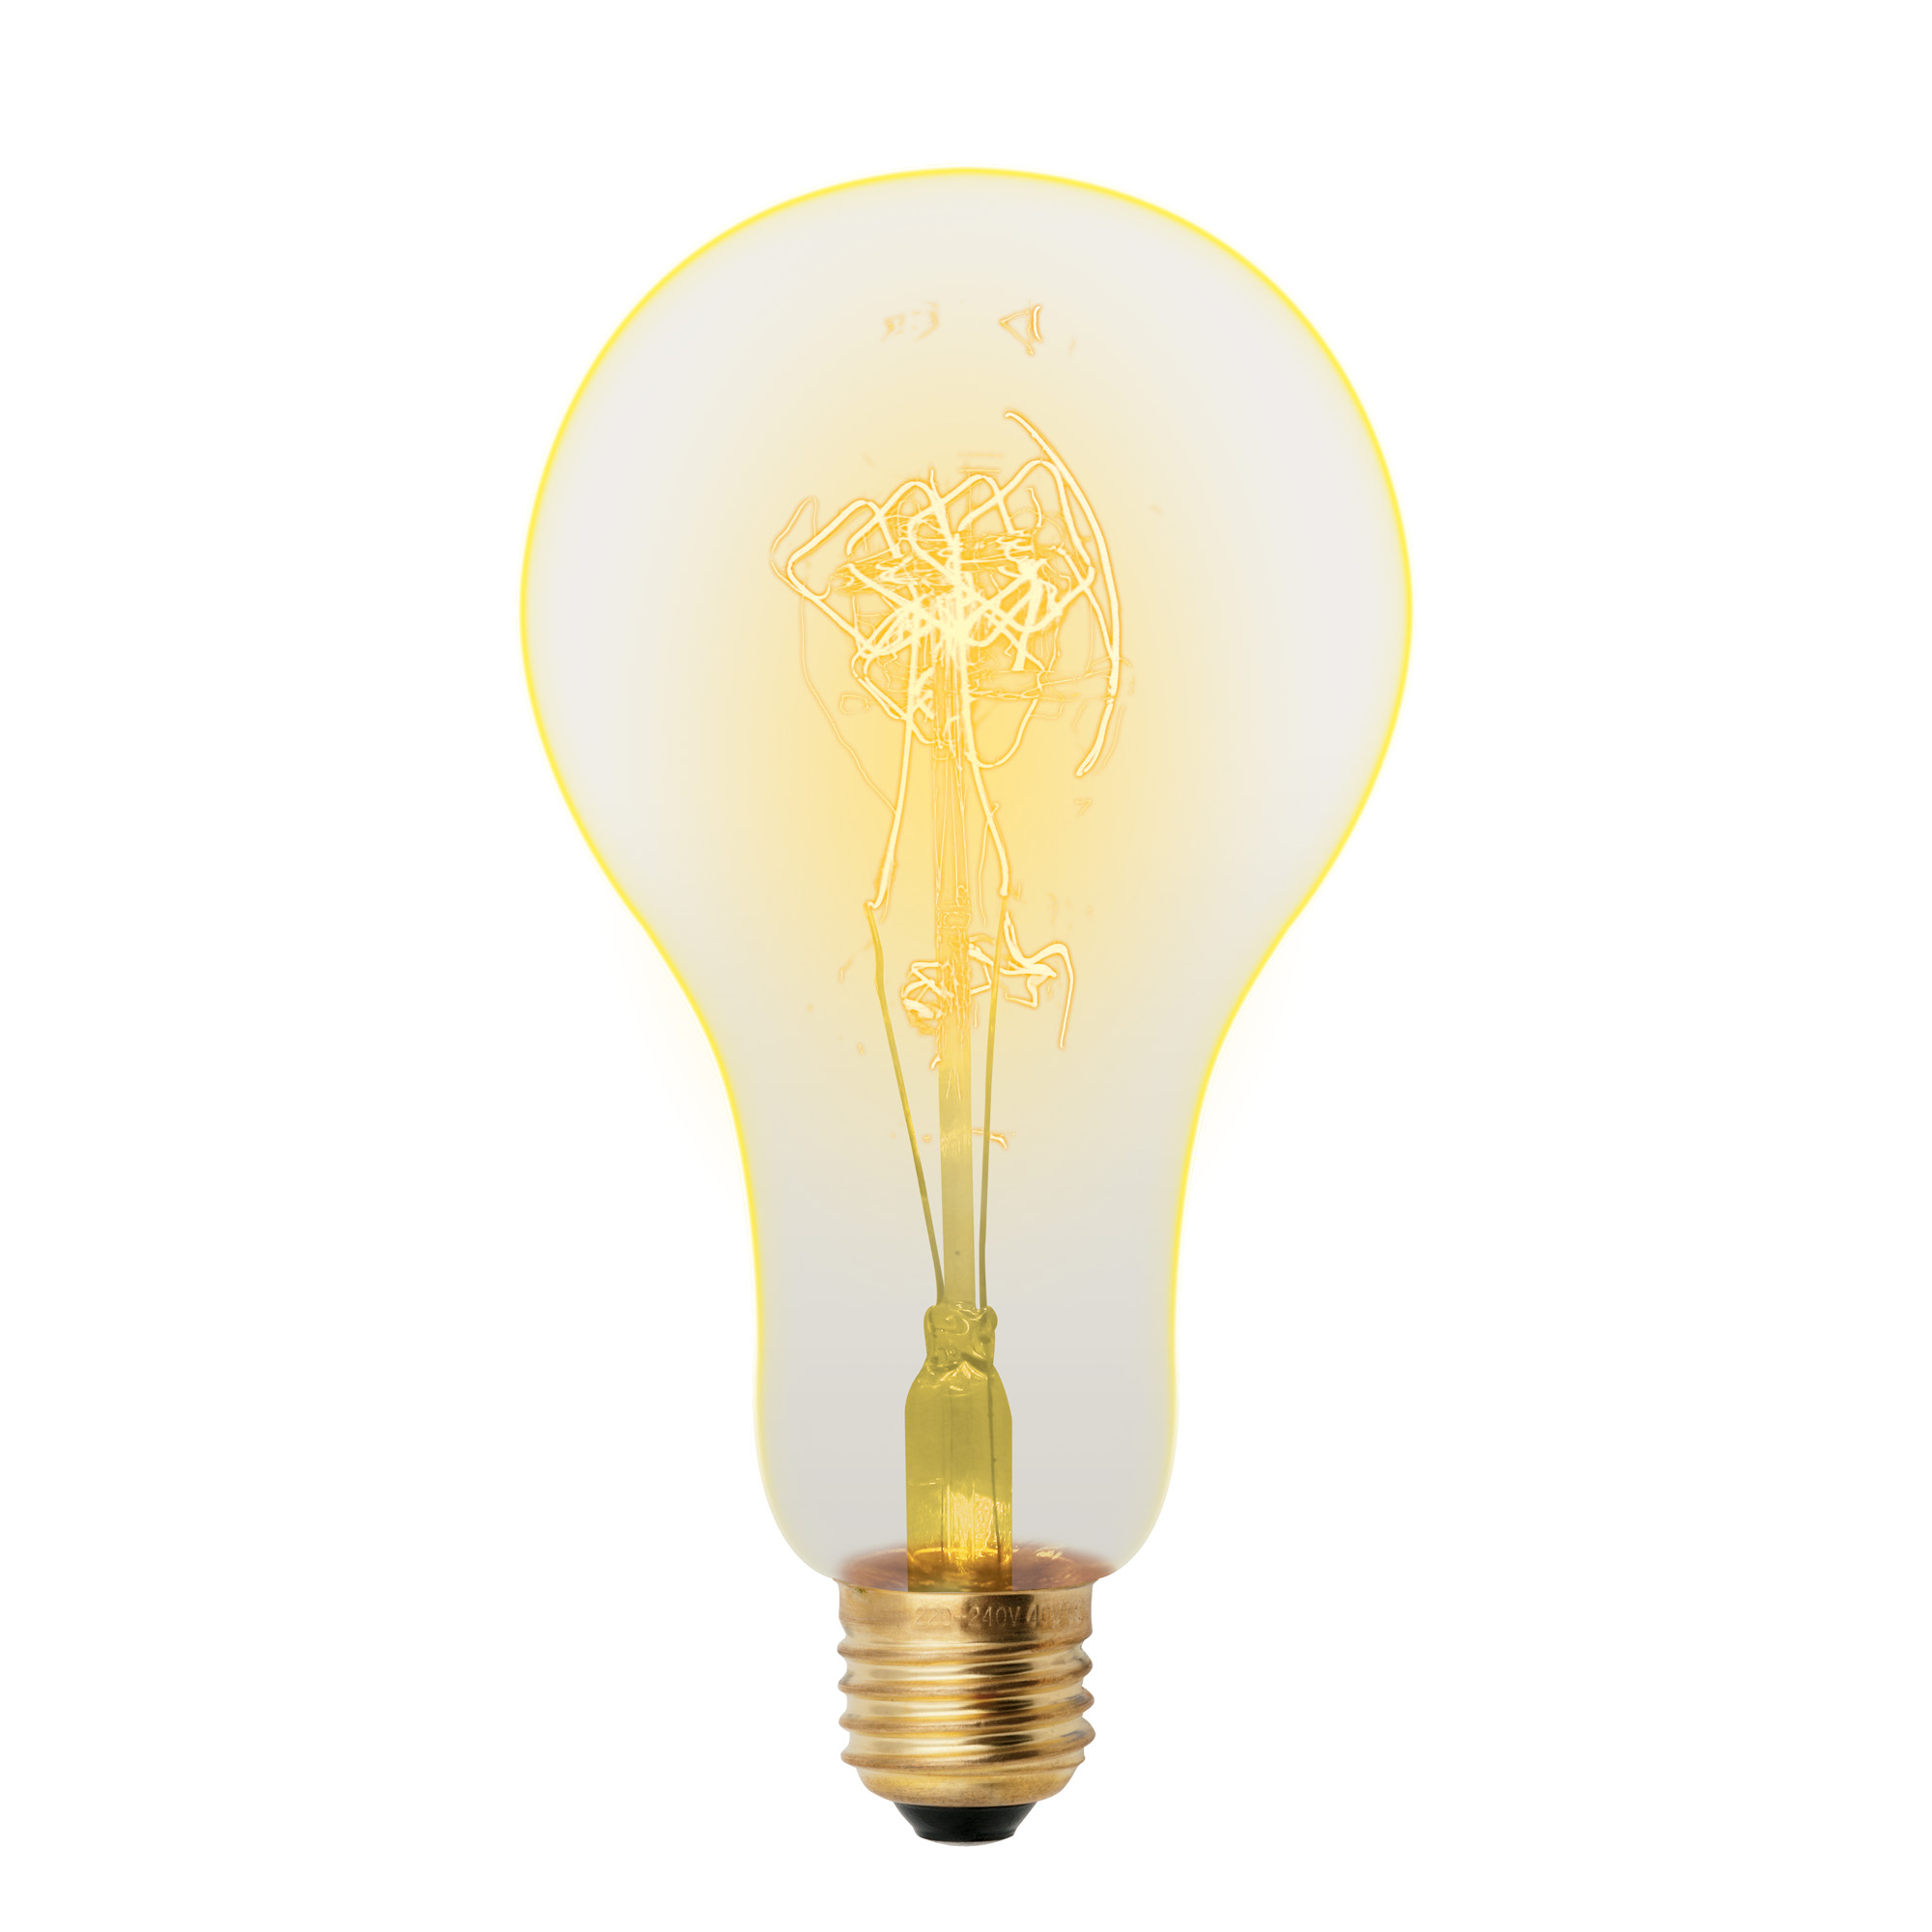 Лампа накаливания Uniel Vintage il-v-a95-60/golden/e27 sw01